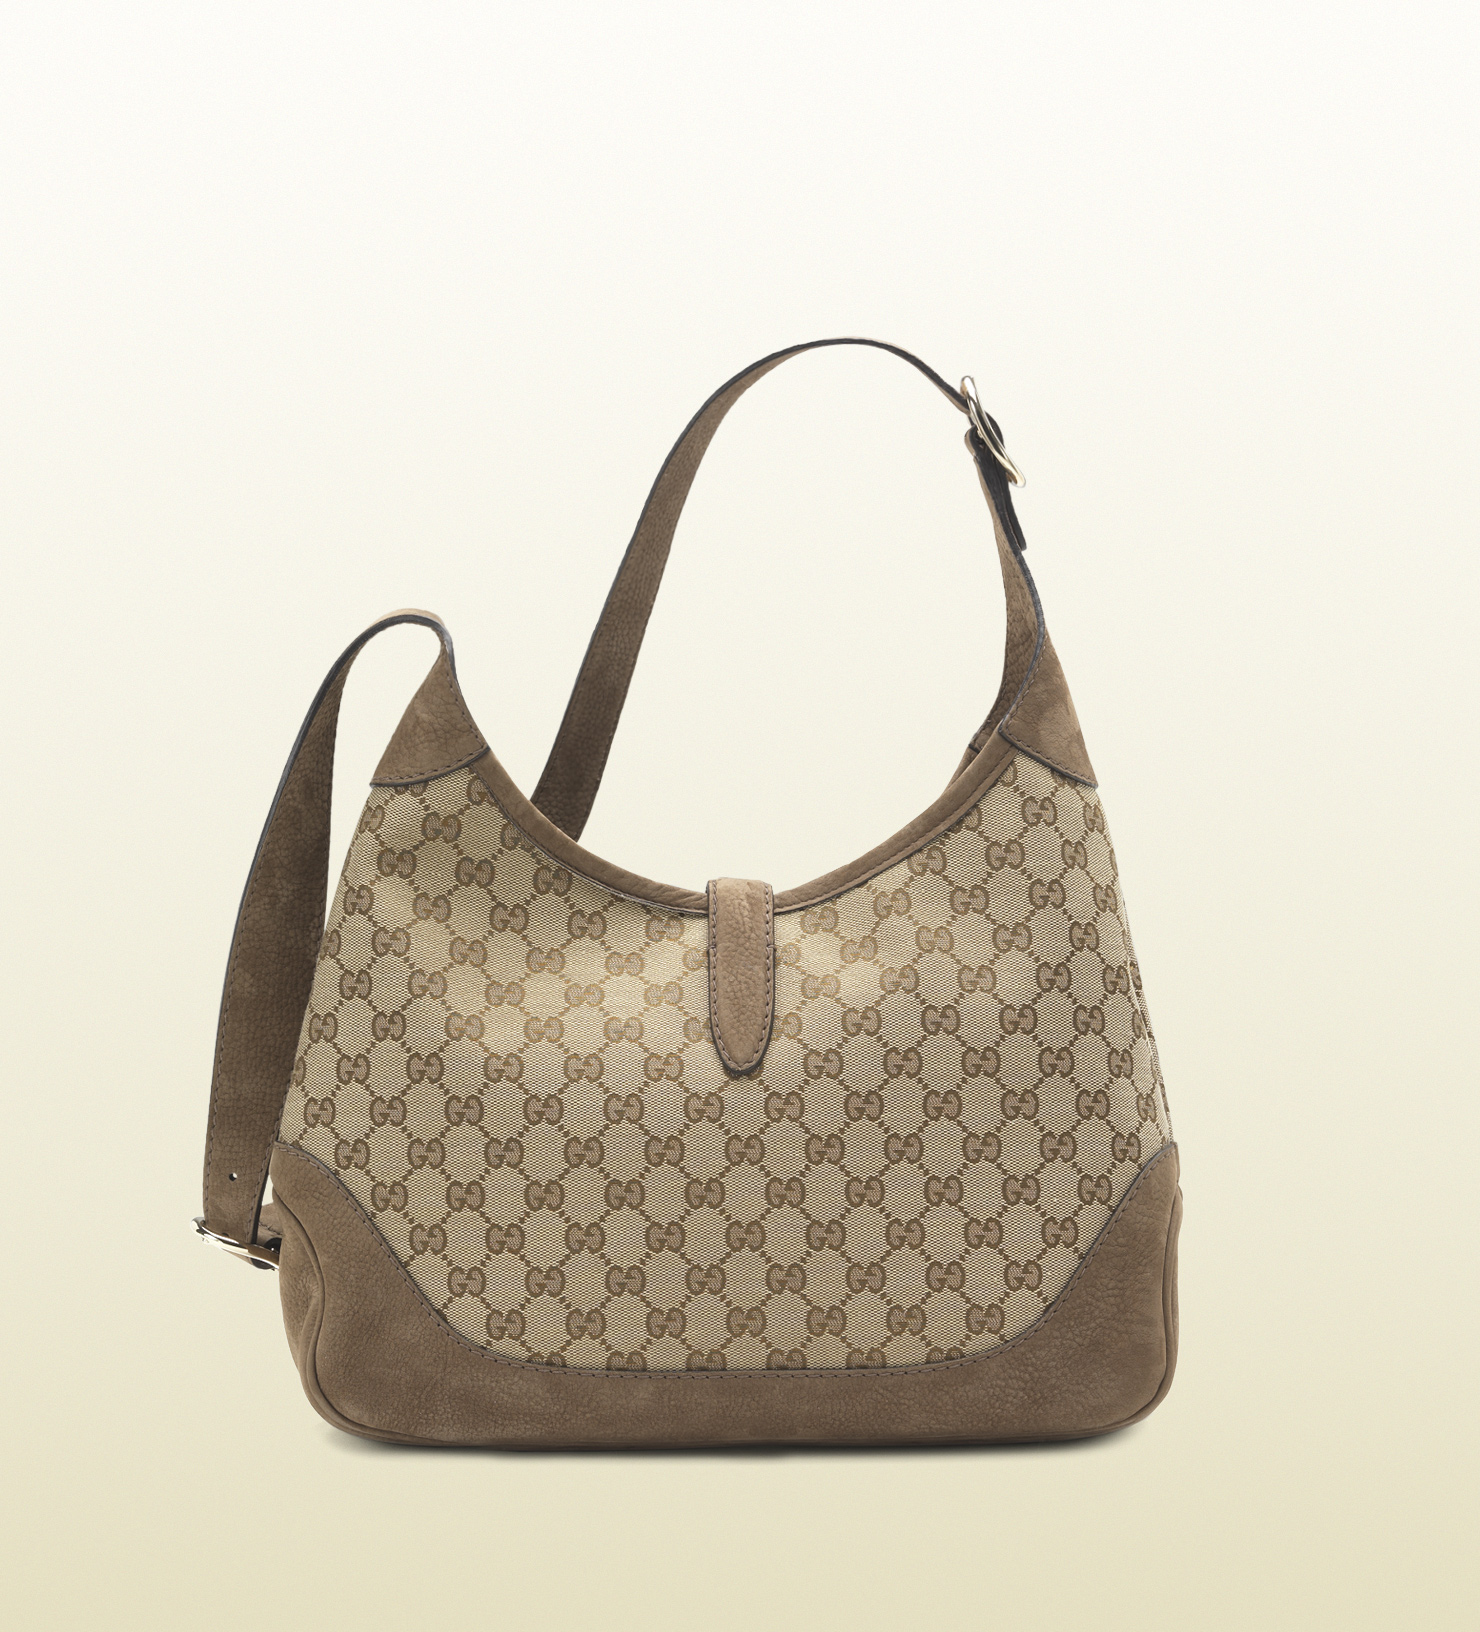 8227a8a6c9430 Gucci Jackie Original Gg Canvas Shoulder Bag in Gray - Lyst